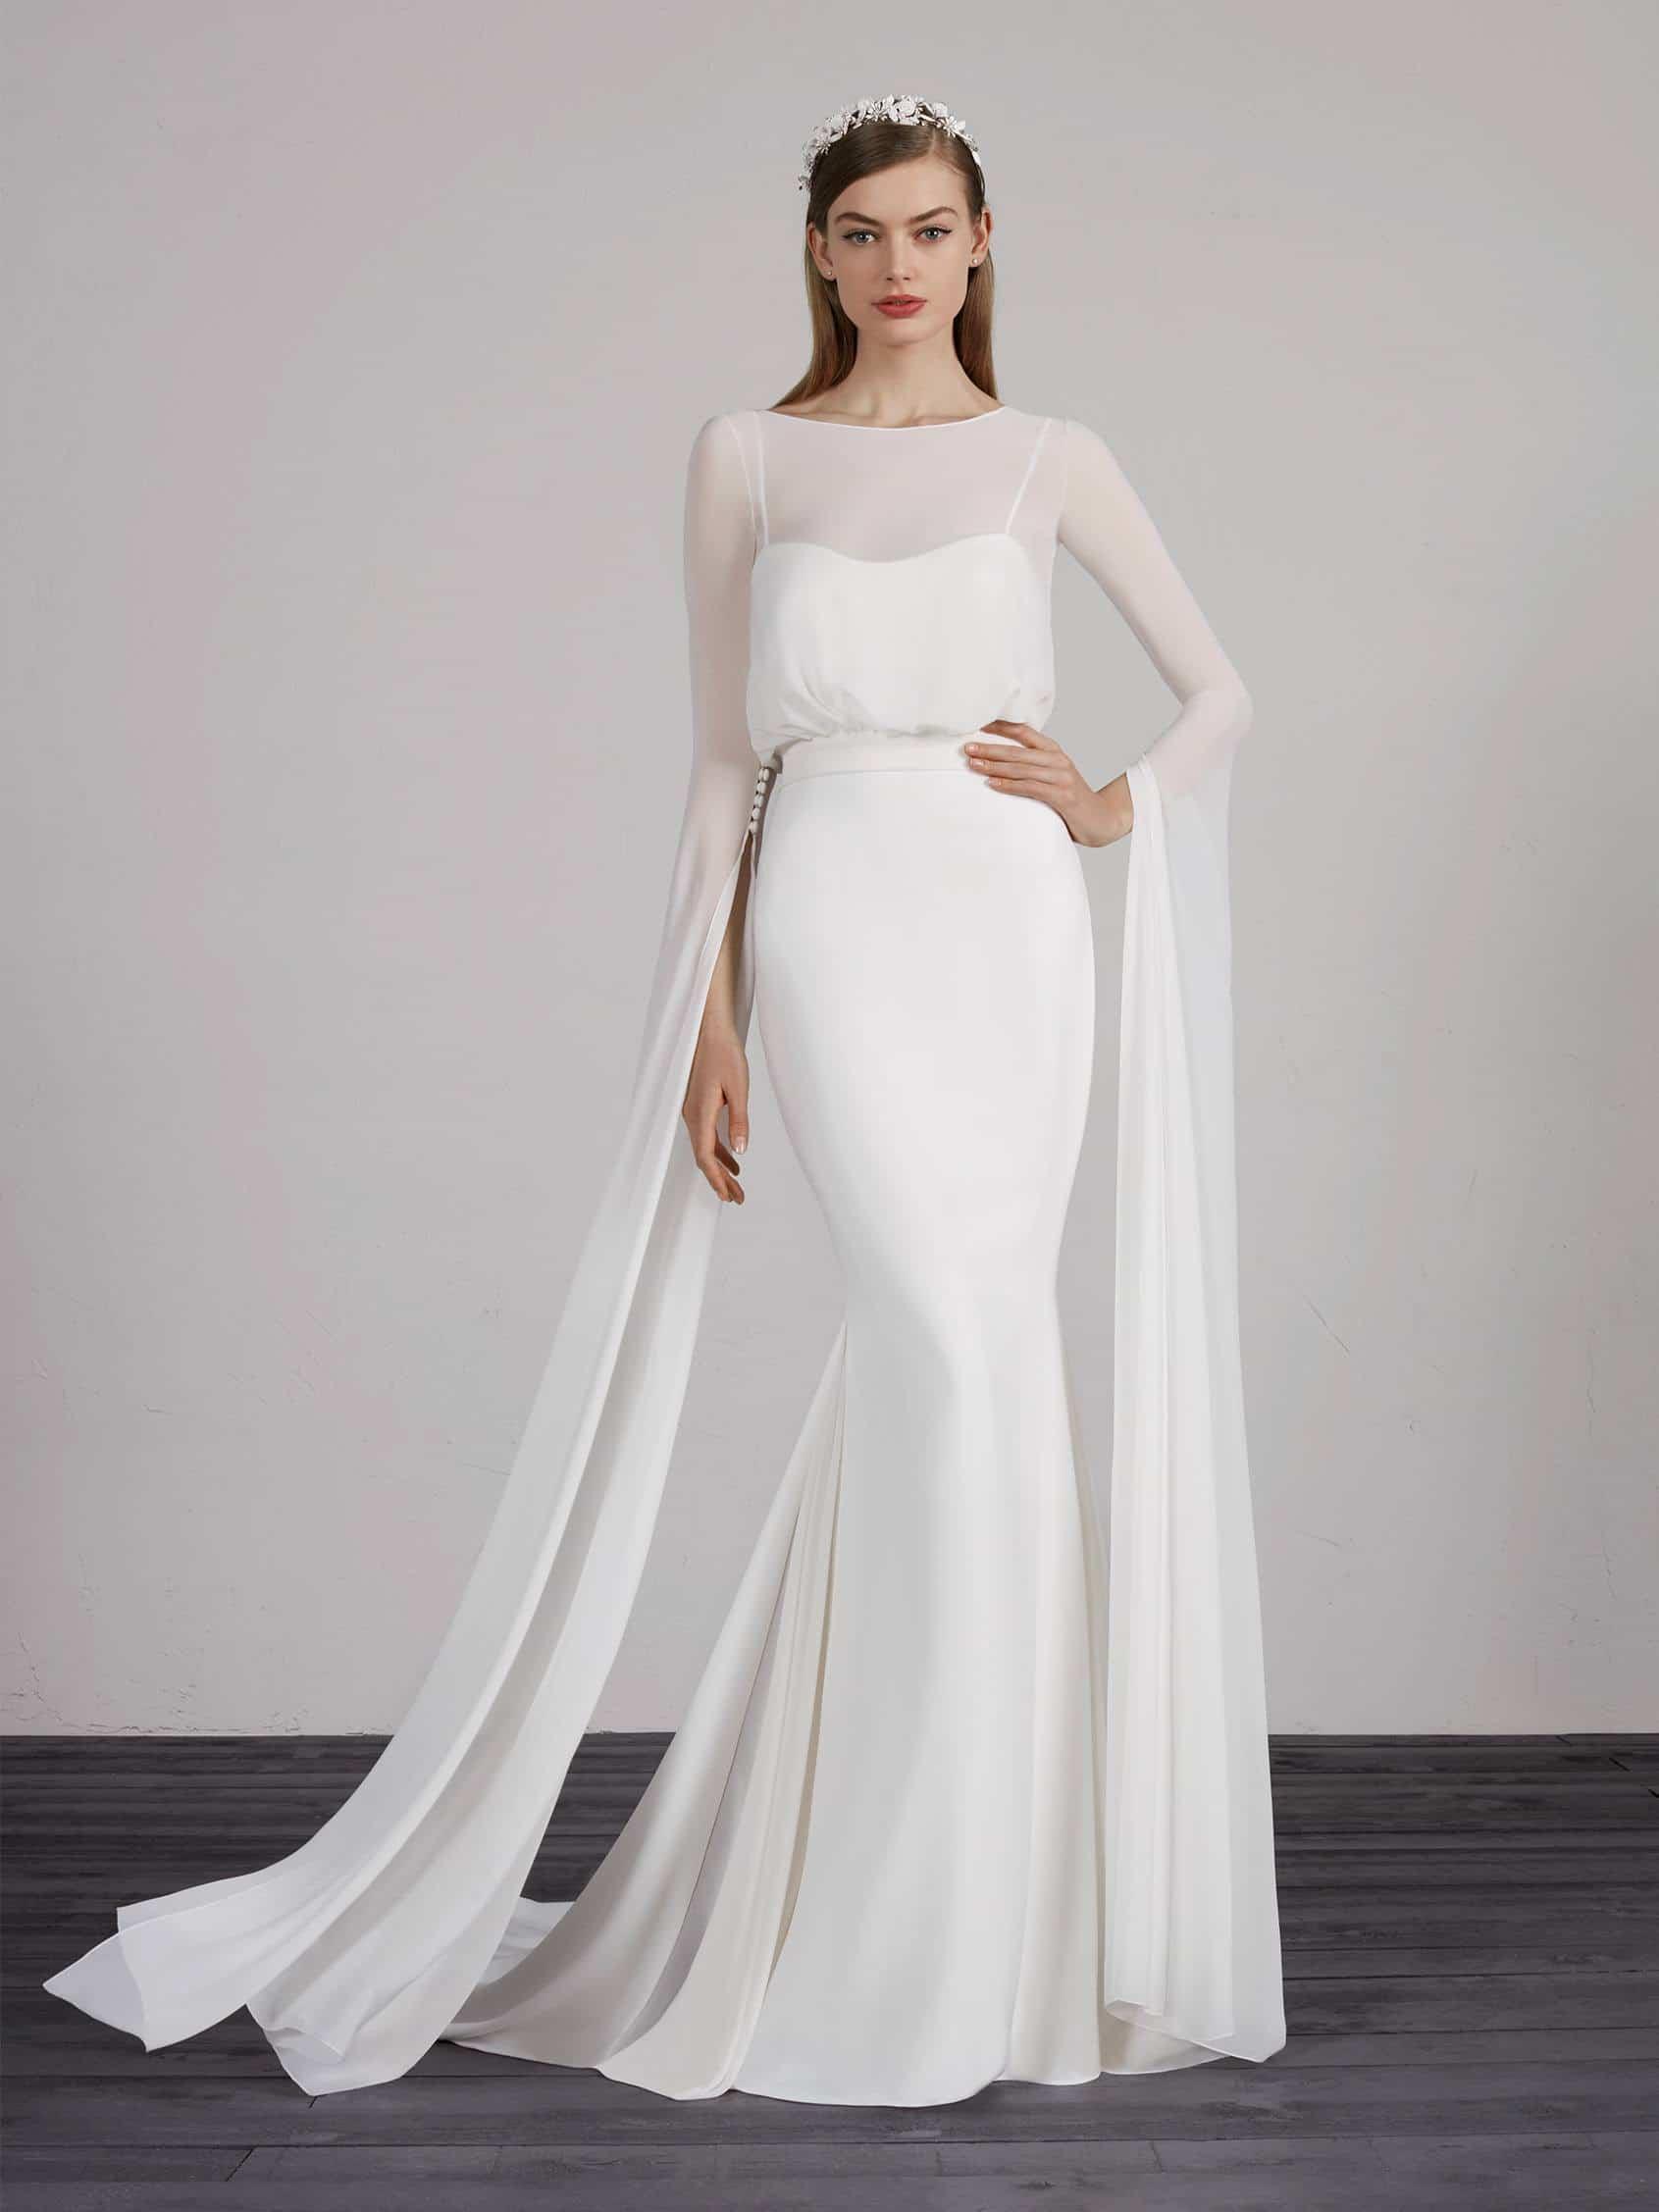 abito da sposa a maniche lunghe